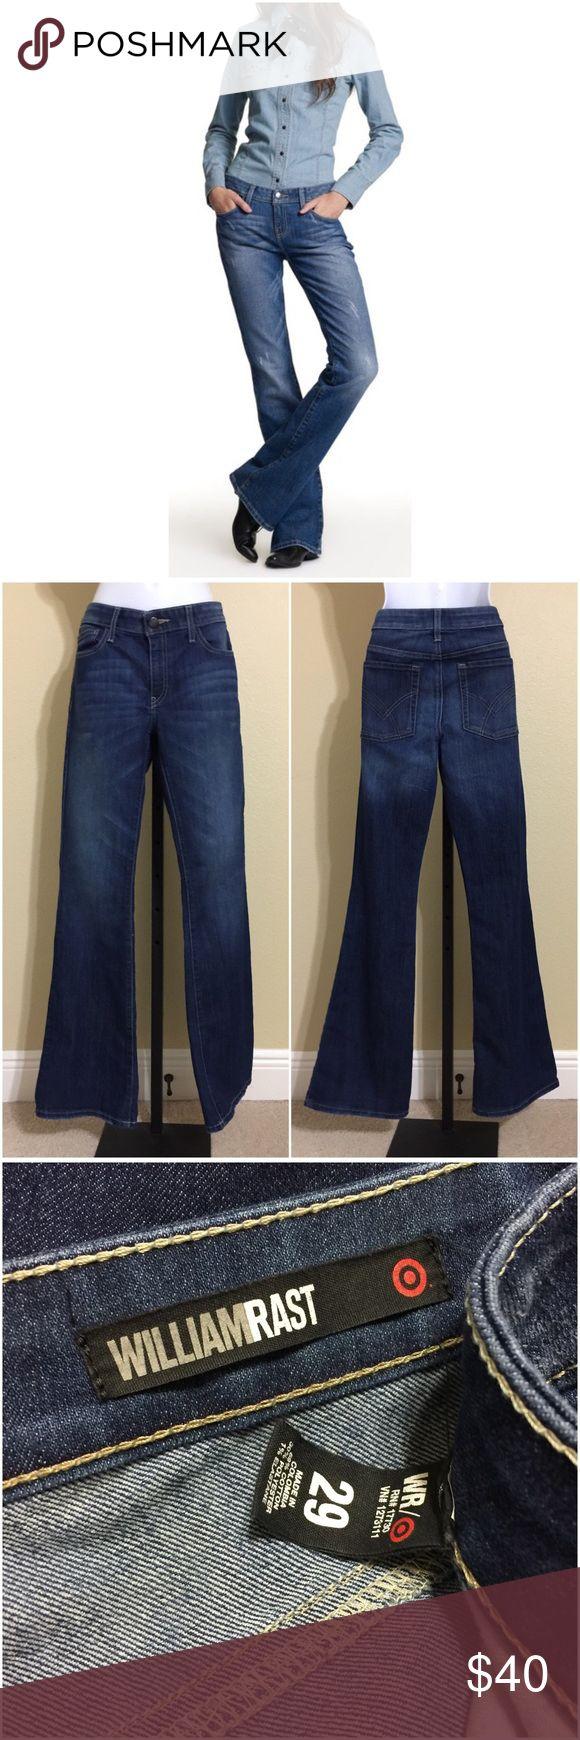 "William Rast For Target Jeans Size 29 William Rast For Target • Flare Leg Jeans • 5 Pocket • Dark Rinse • 69% Cotton 30% Polyester 1% Elastane • Size 29 • 33"" Length • 8.5"" Rise • 32"" Waist • 38"" Hips • 20"" Cuff William Rast Jeans Flare & Wide Leg"